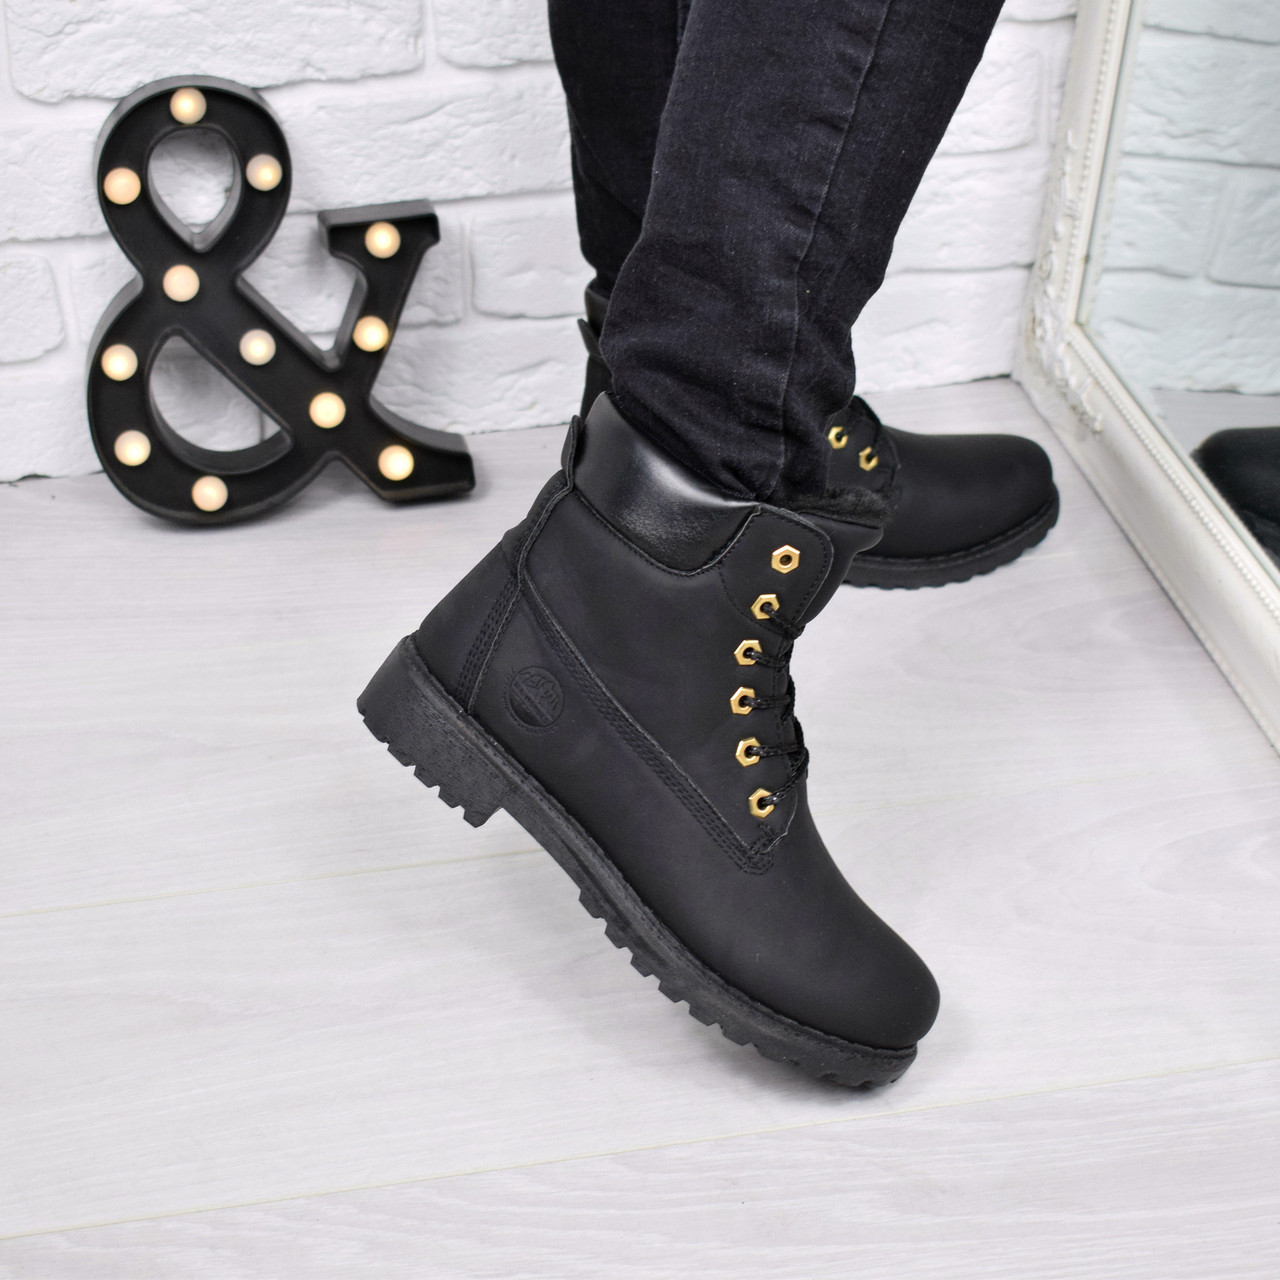 78375ba5f70a Ботинки женские Timber черные Зима 3778,Размер 39, ботинки женские -  Интернет - магазин